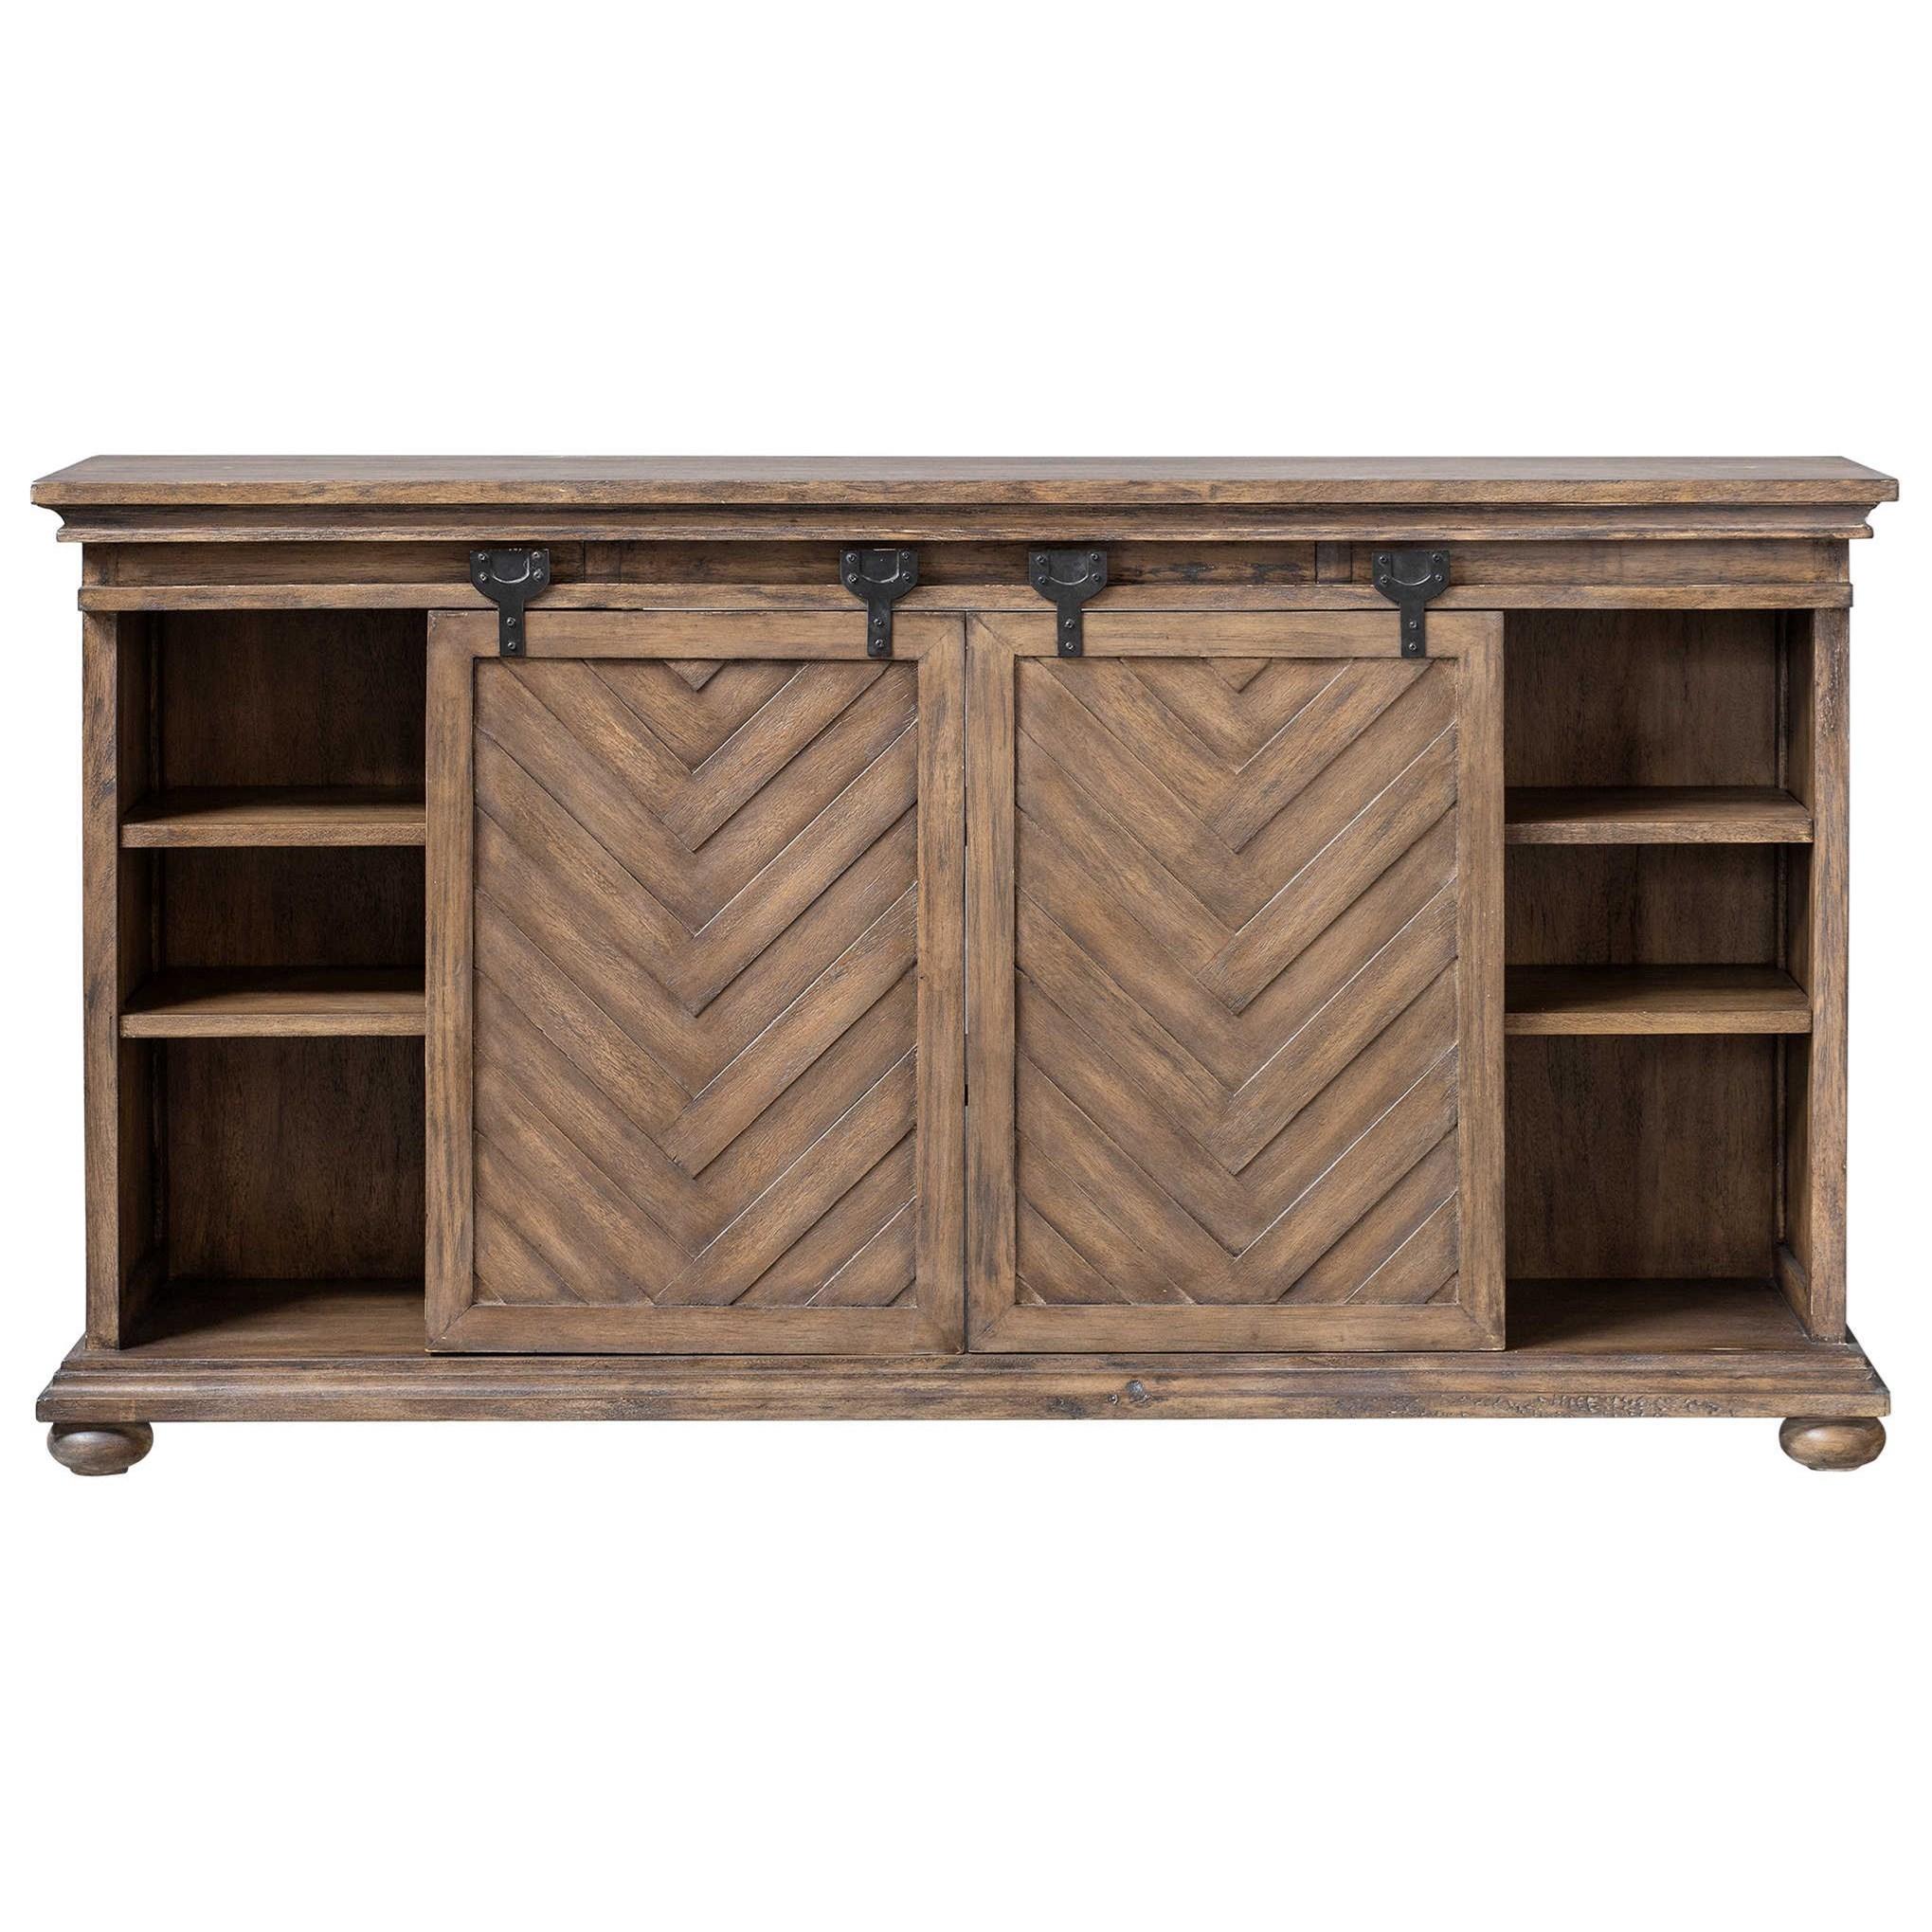 Accent Furniture Primalia Barn Door Media Console by Uttermost at Mueller Furniture